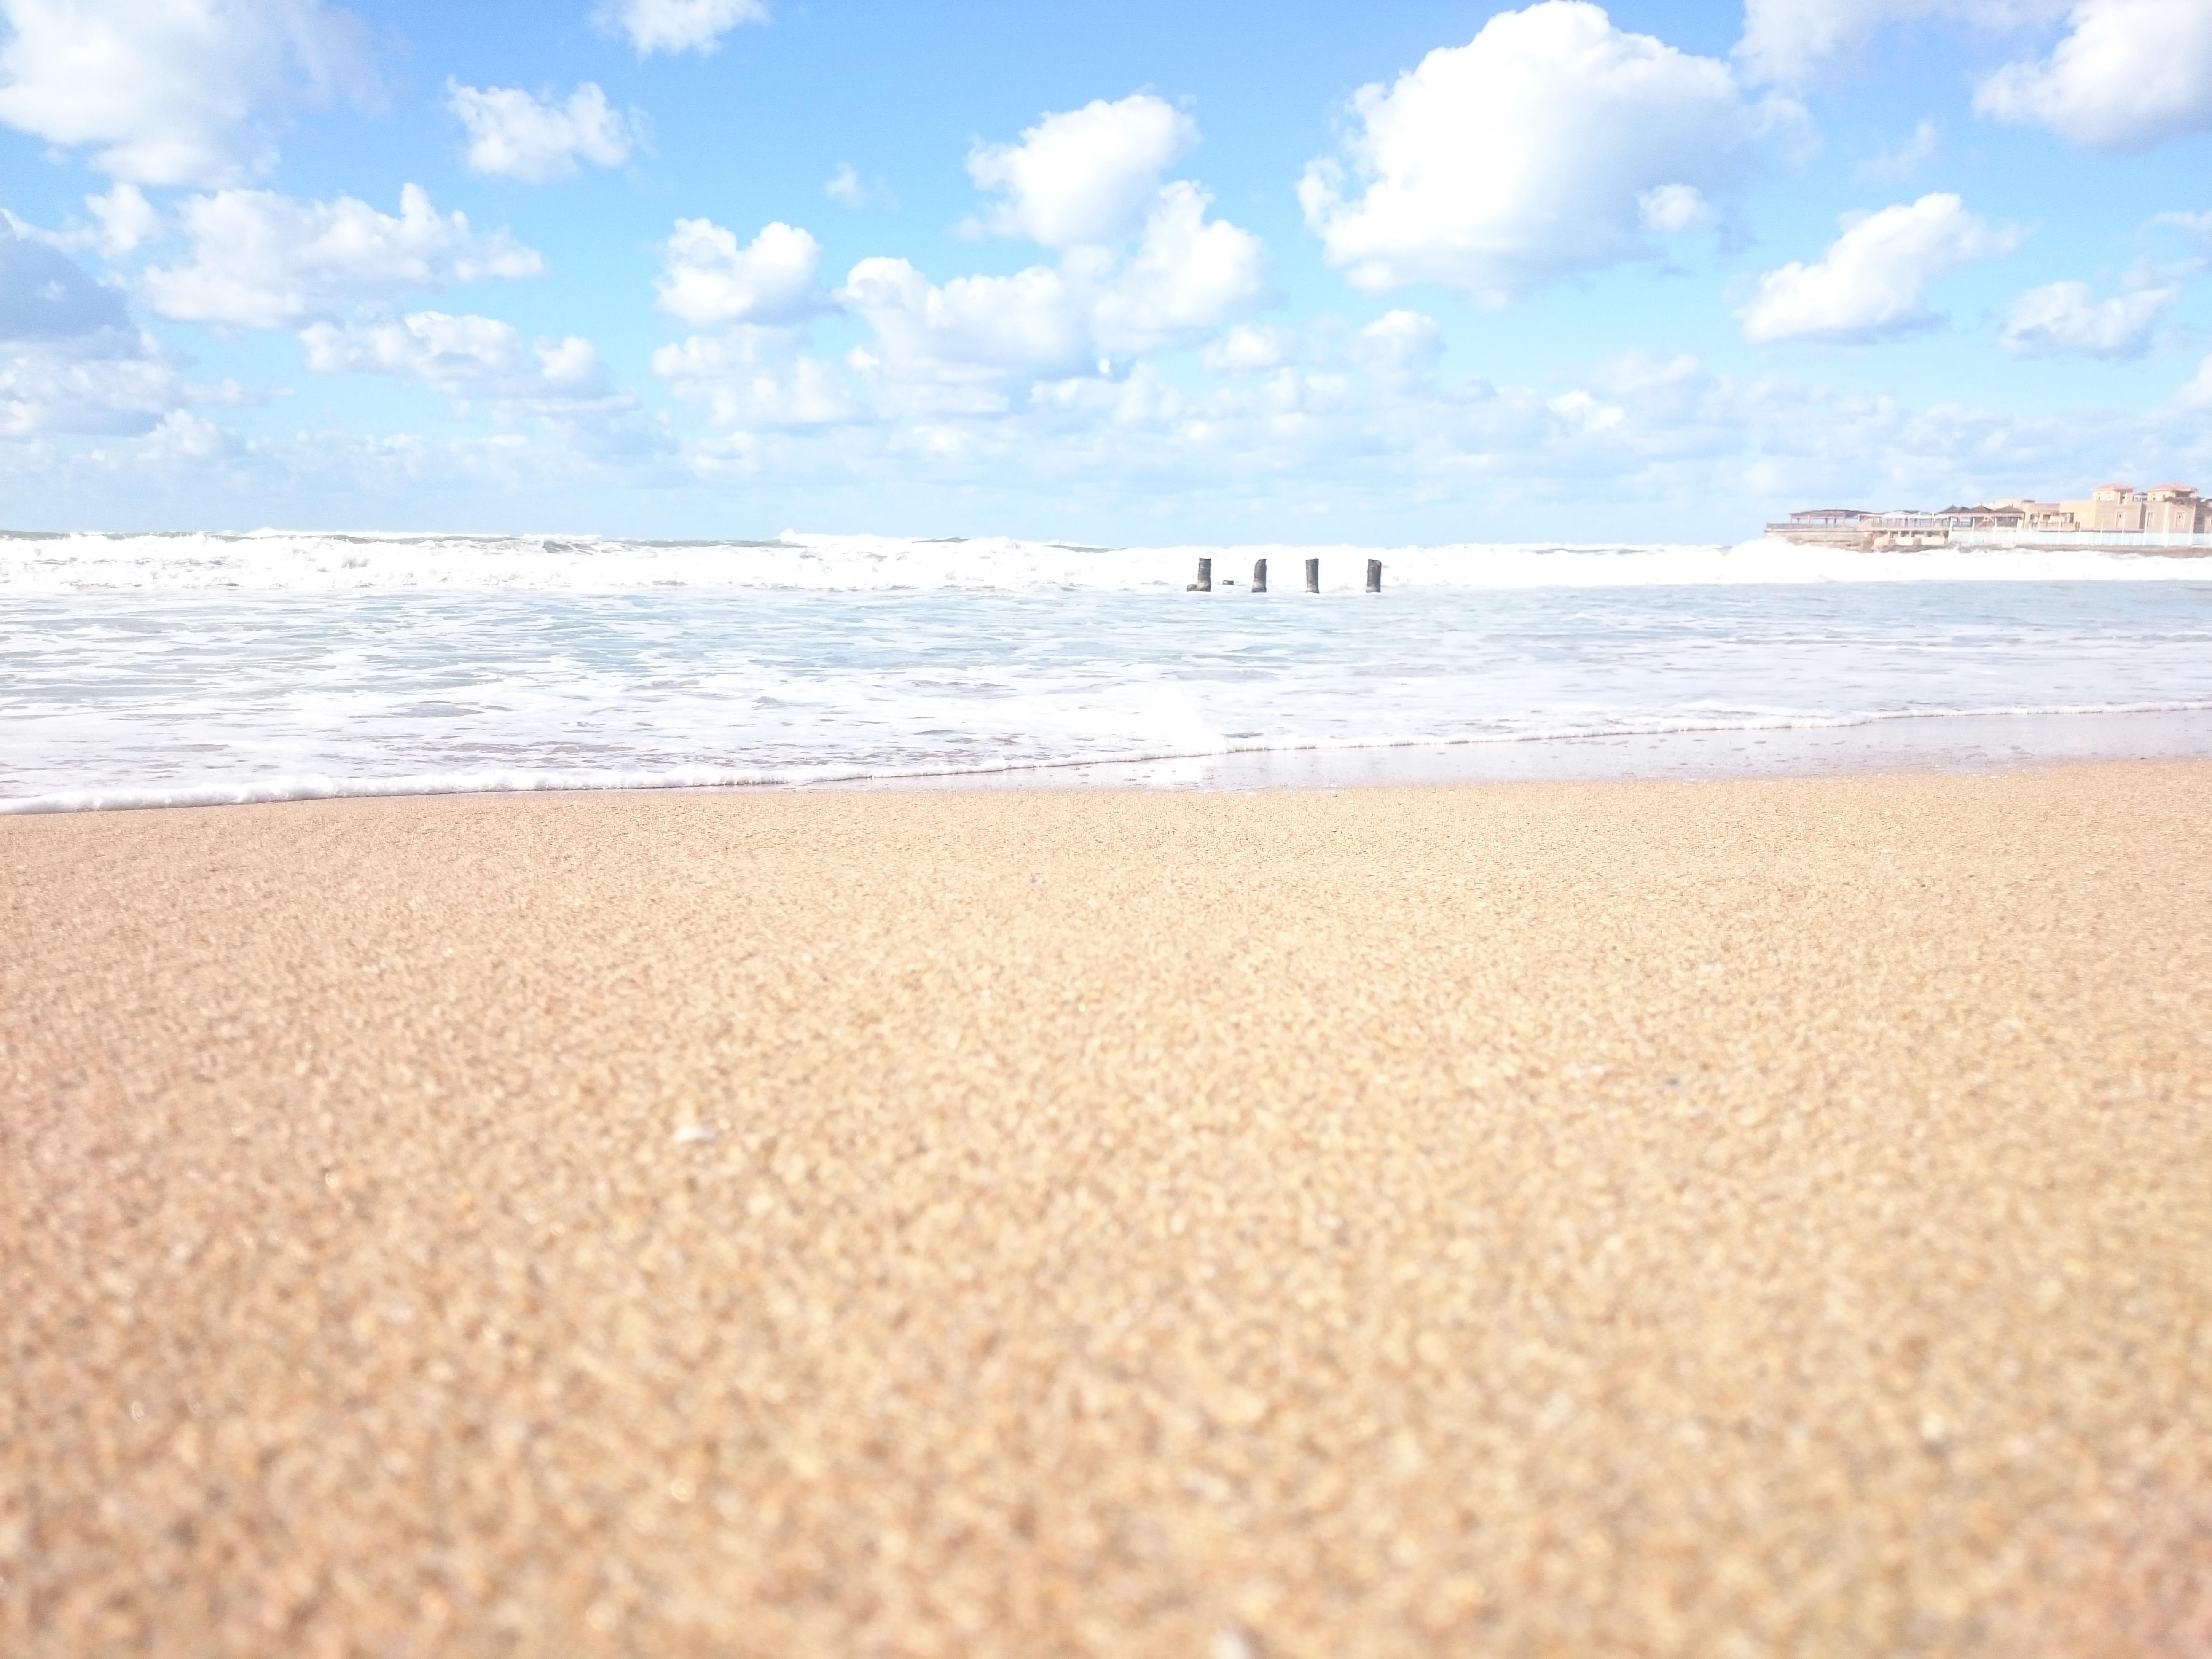 free images beach sea coast nature sand ocean horizon shore